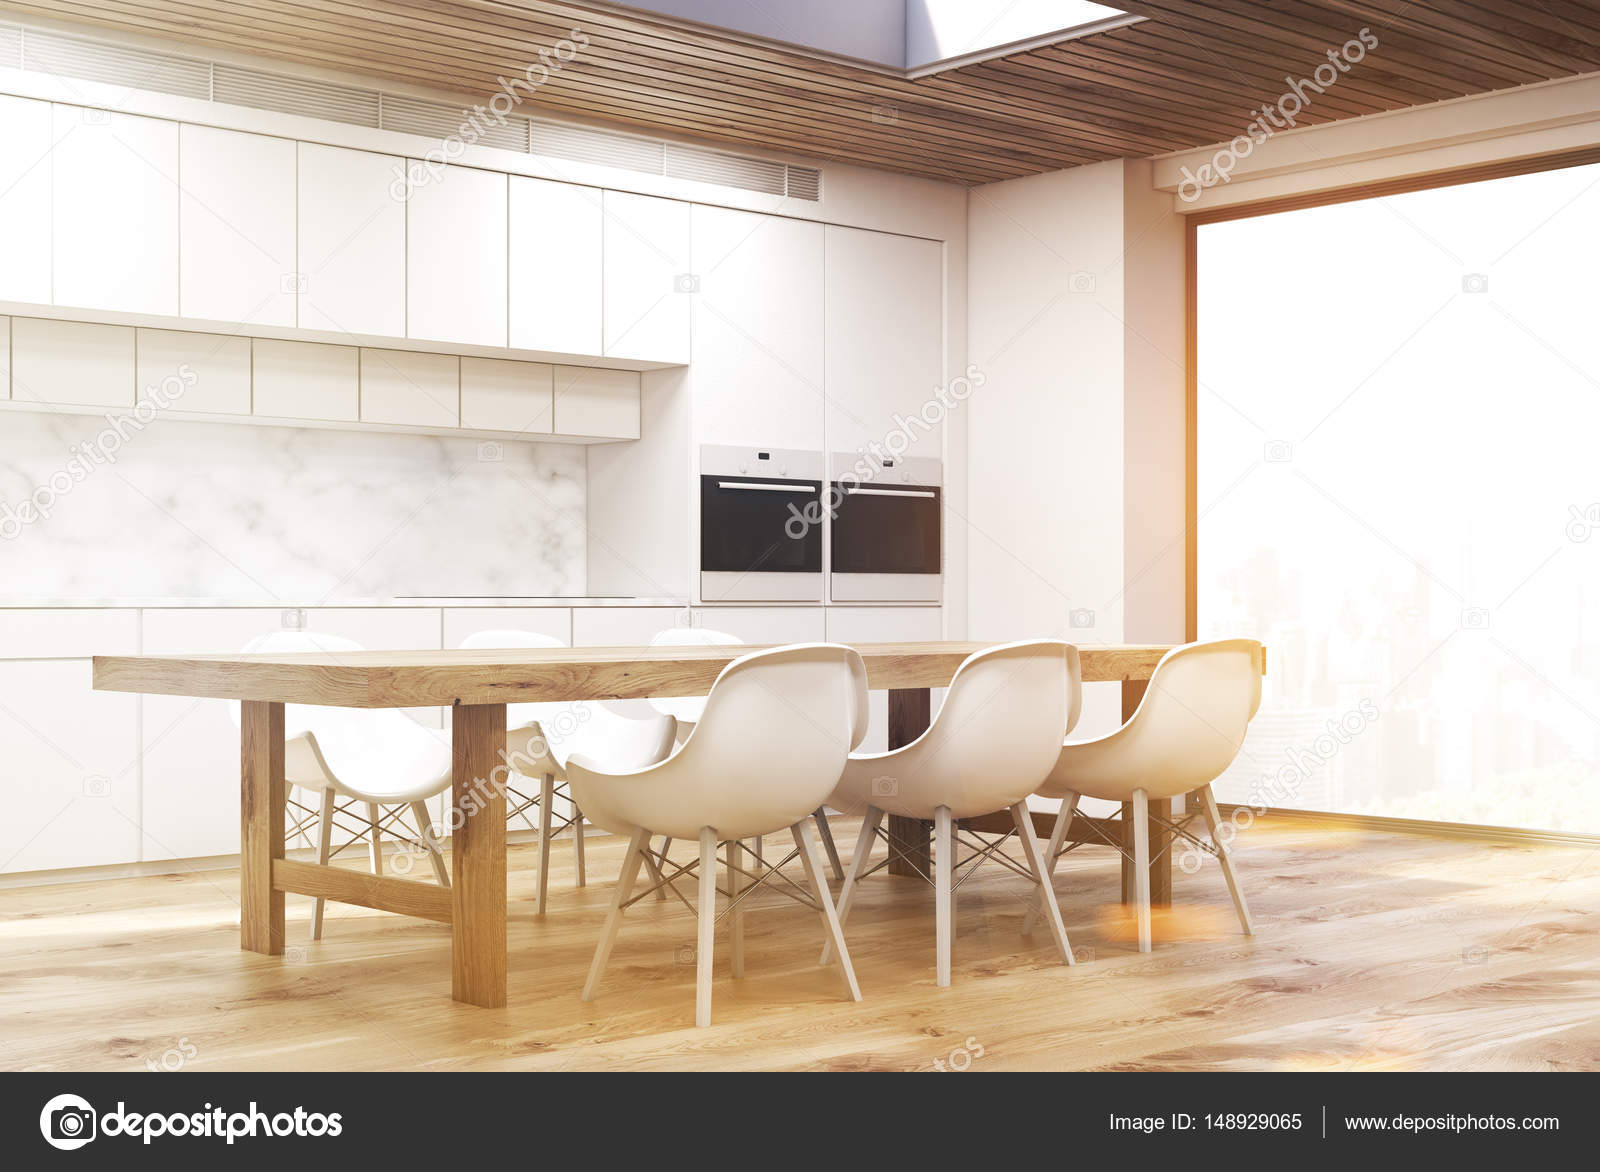 long kitchen tables and bath design 大理石厨房用长长的桌子边 定了调子 图库照片 c denisismagilov 148929065